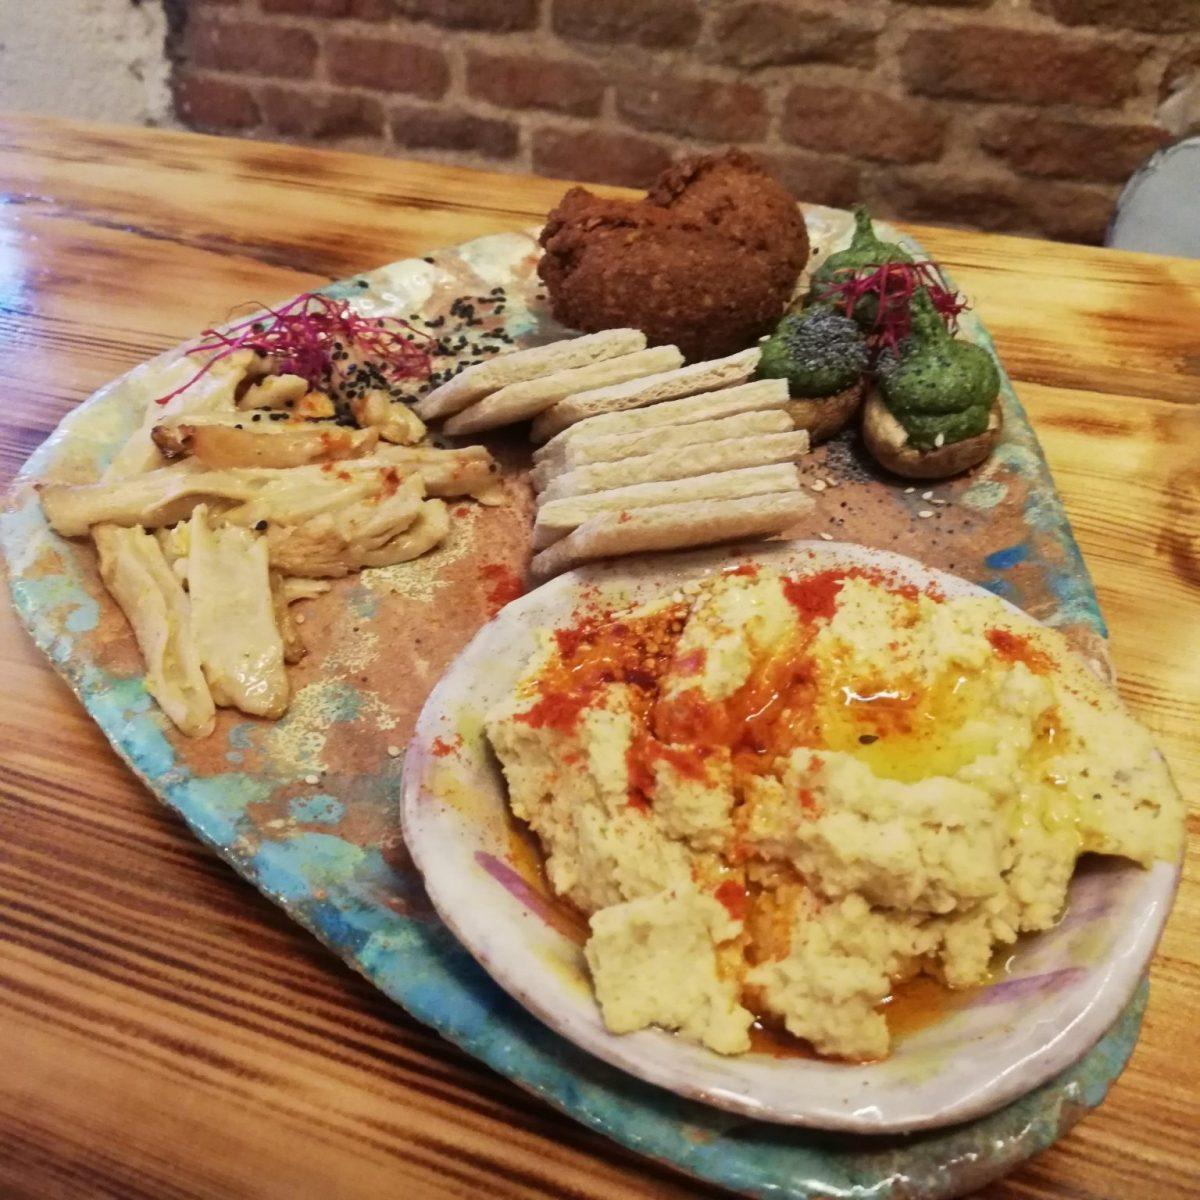 Mediterranean vegan tapas platter at La Encomienda in Madrid